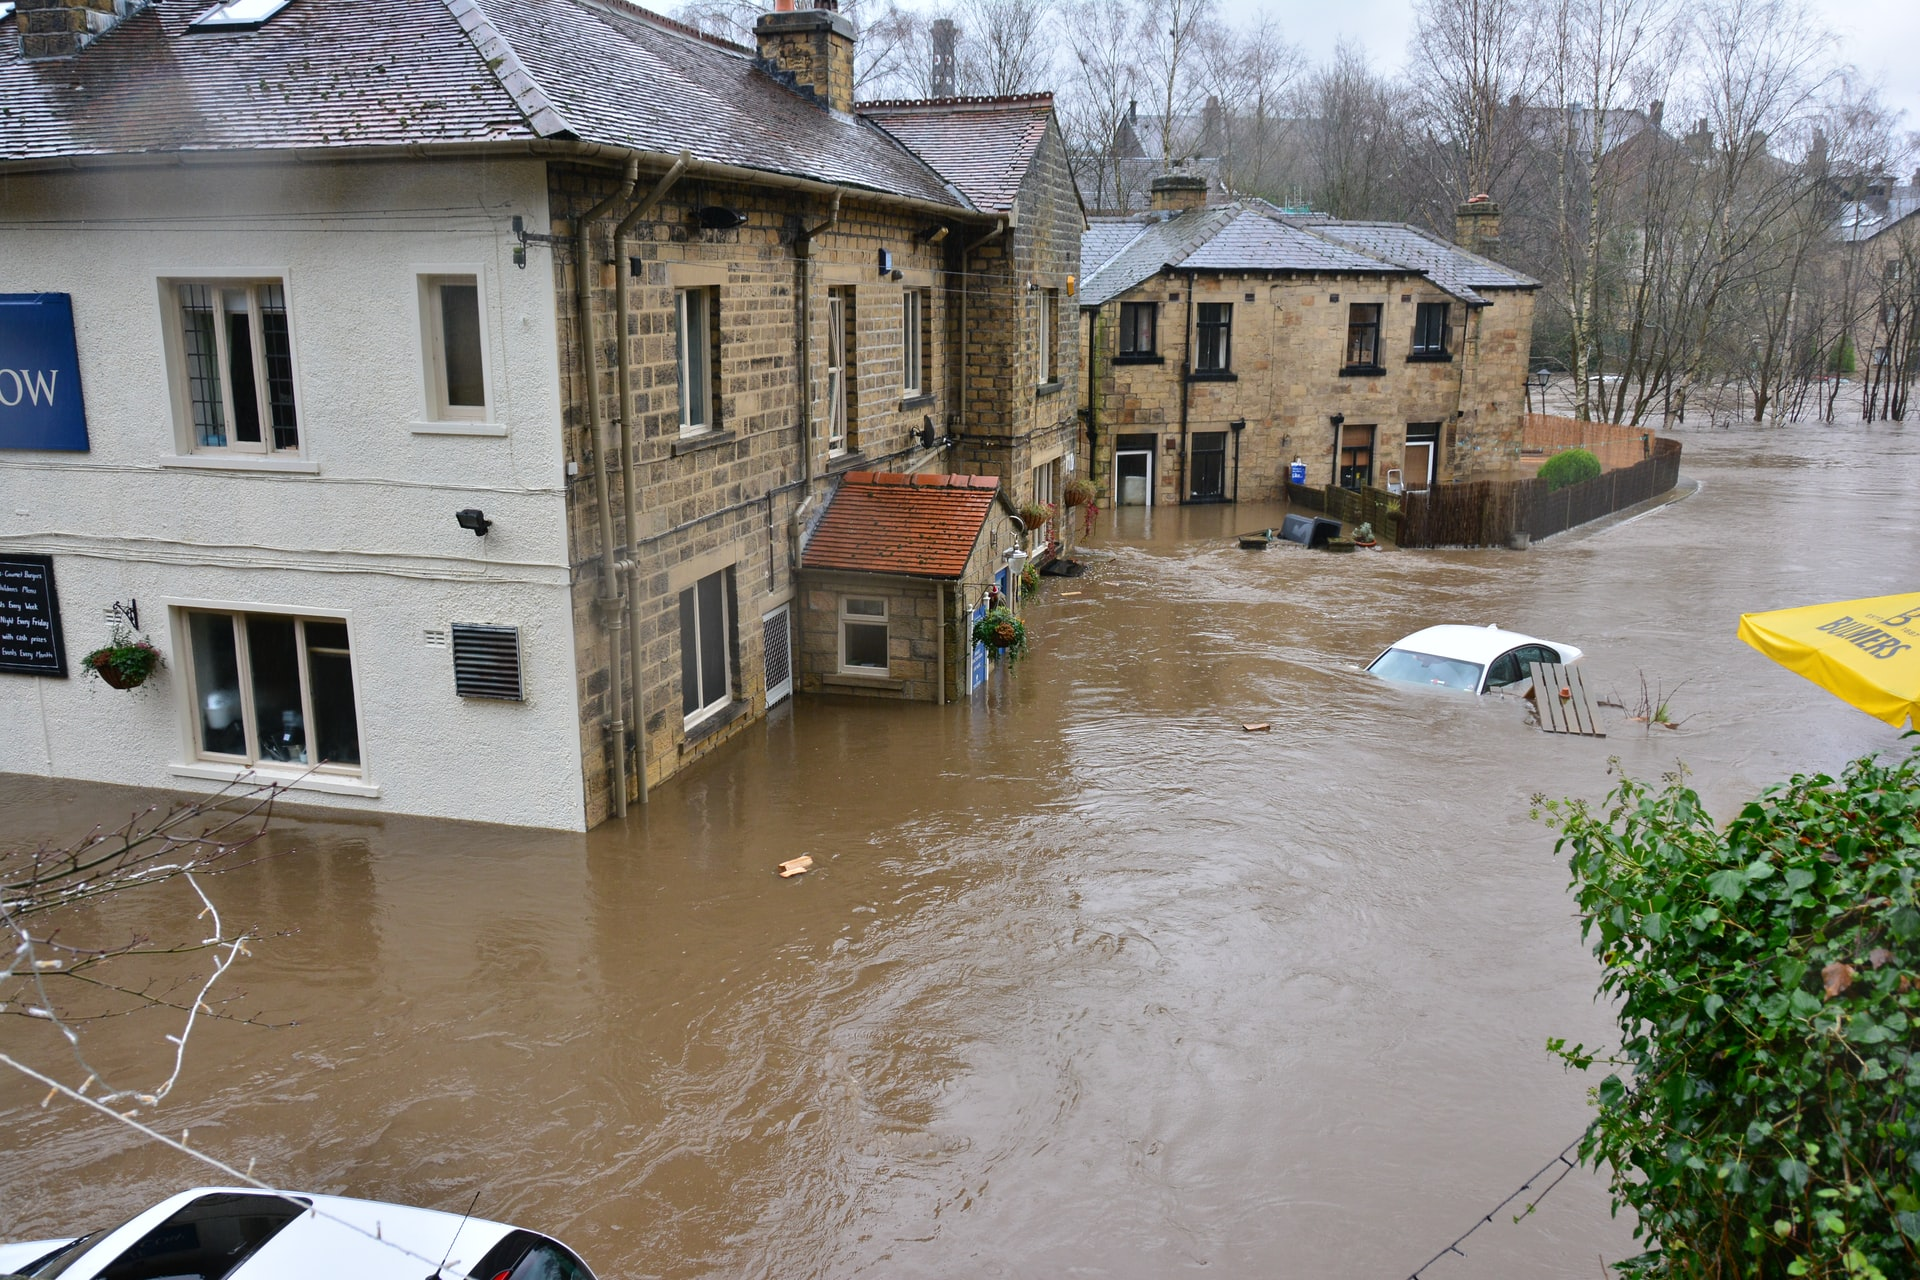 chris gallagher 9Jgn8hSYUFc unsplash - Overstromingen: welke schade wordt wél en niet vergoed? - Brixxs